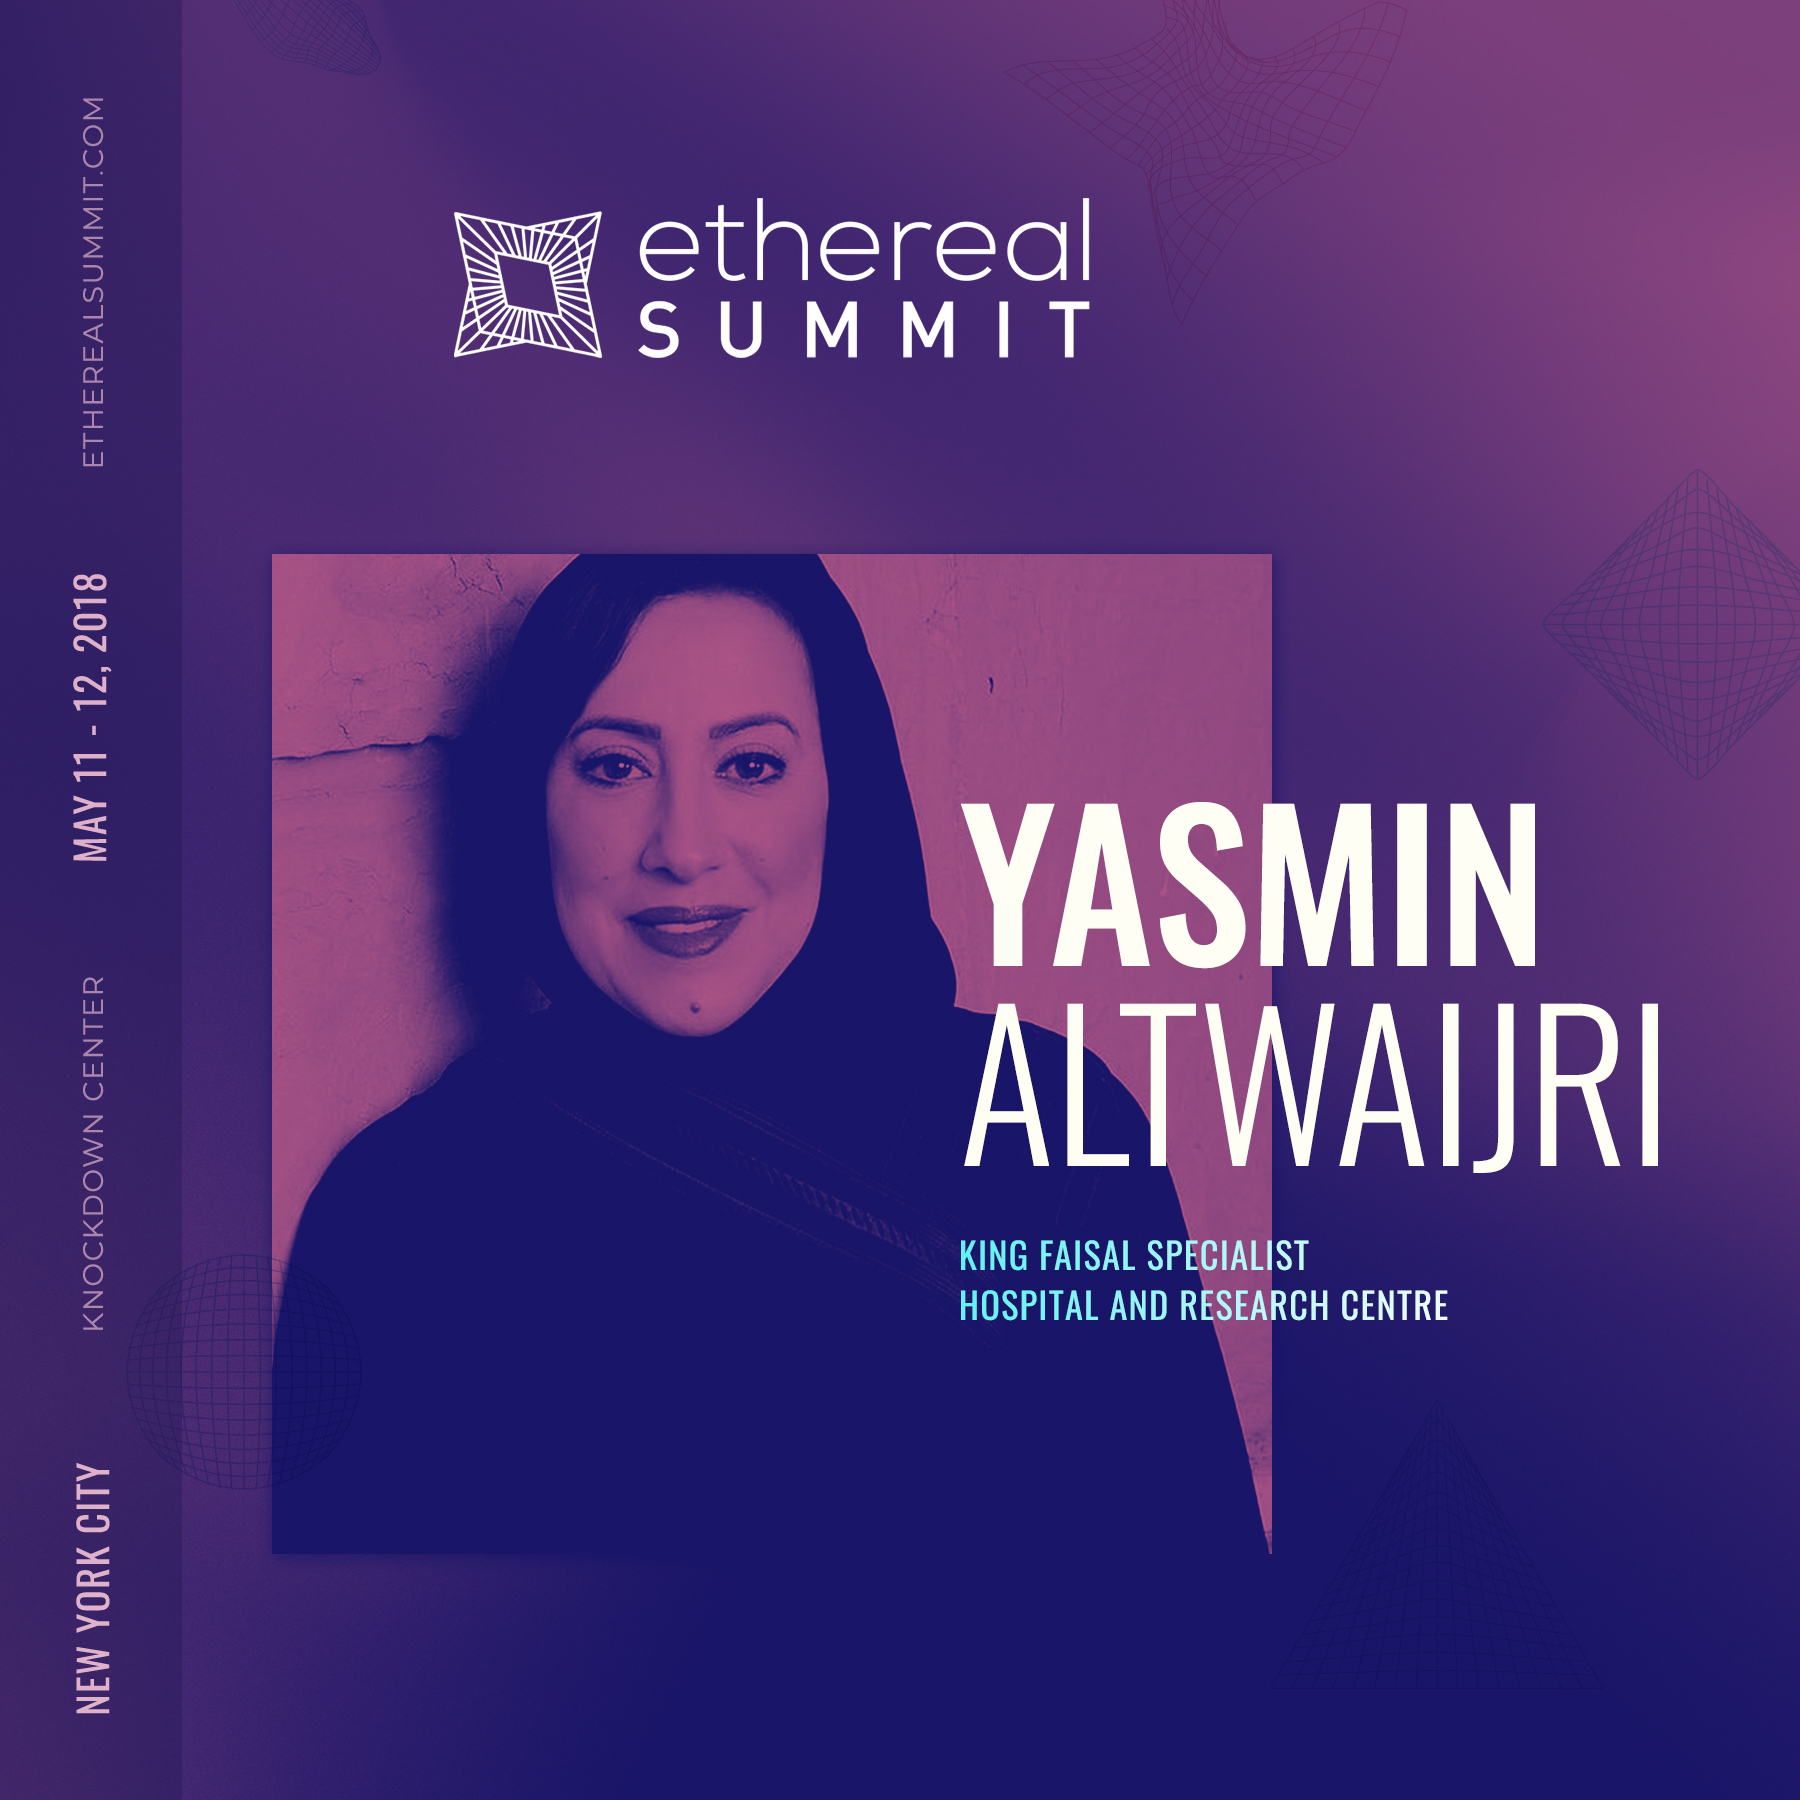 Yasmin Altwaijri